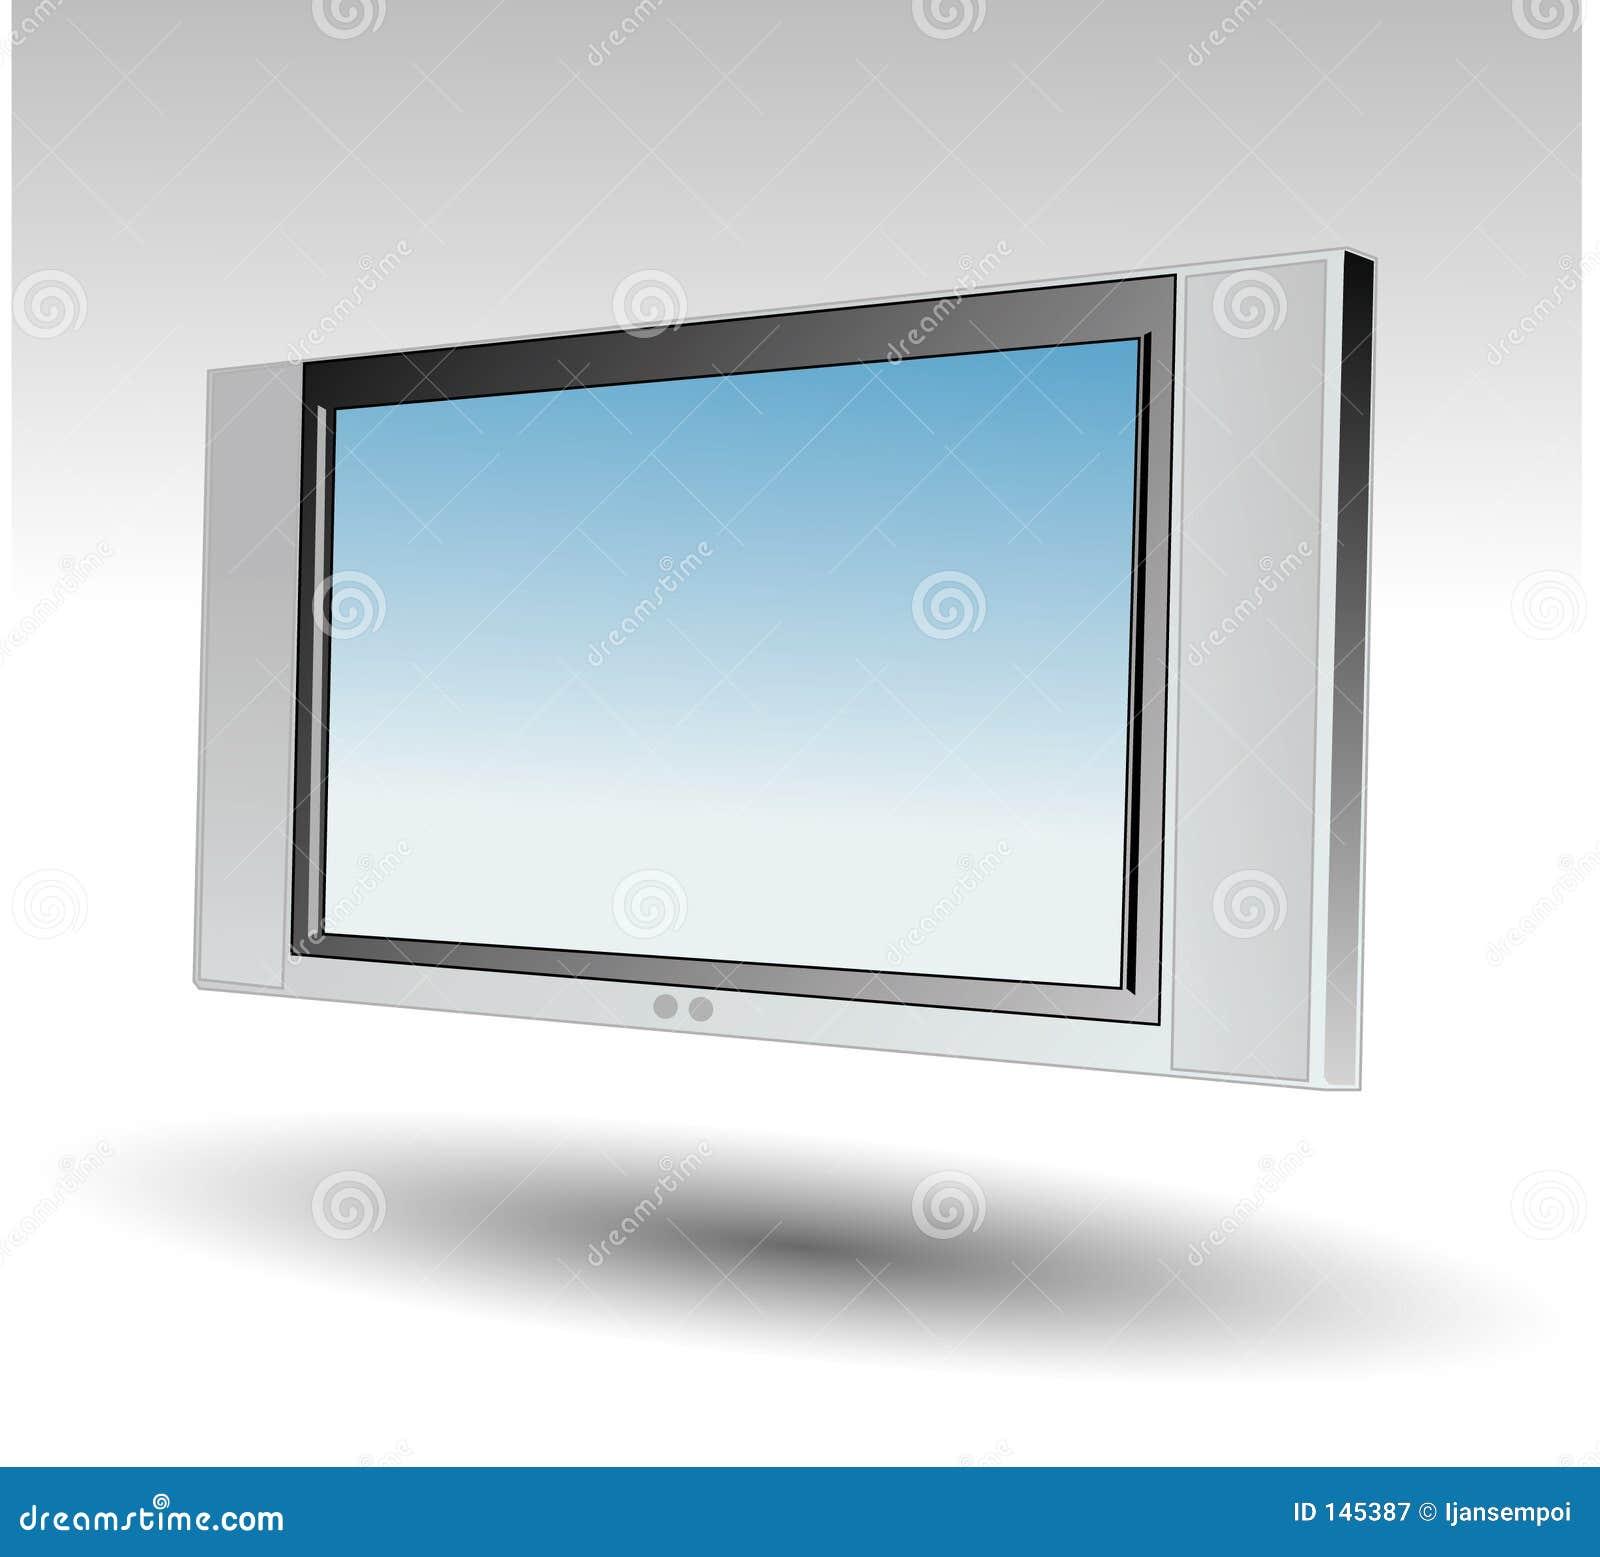 Tv osocza